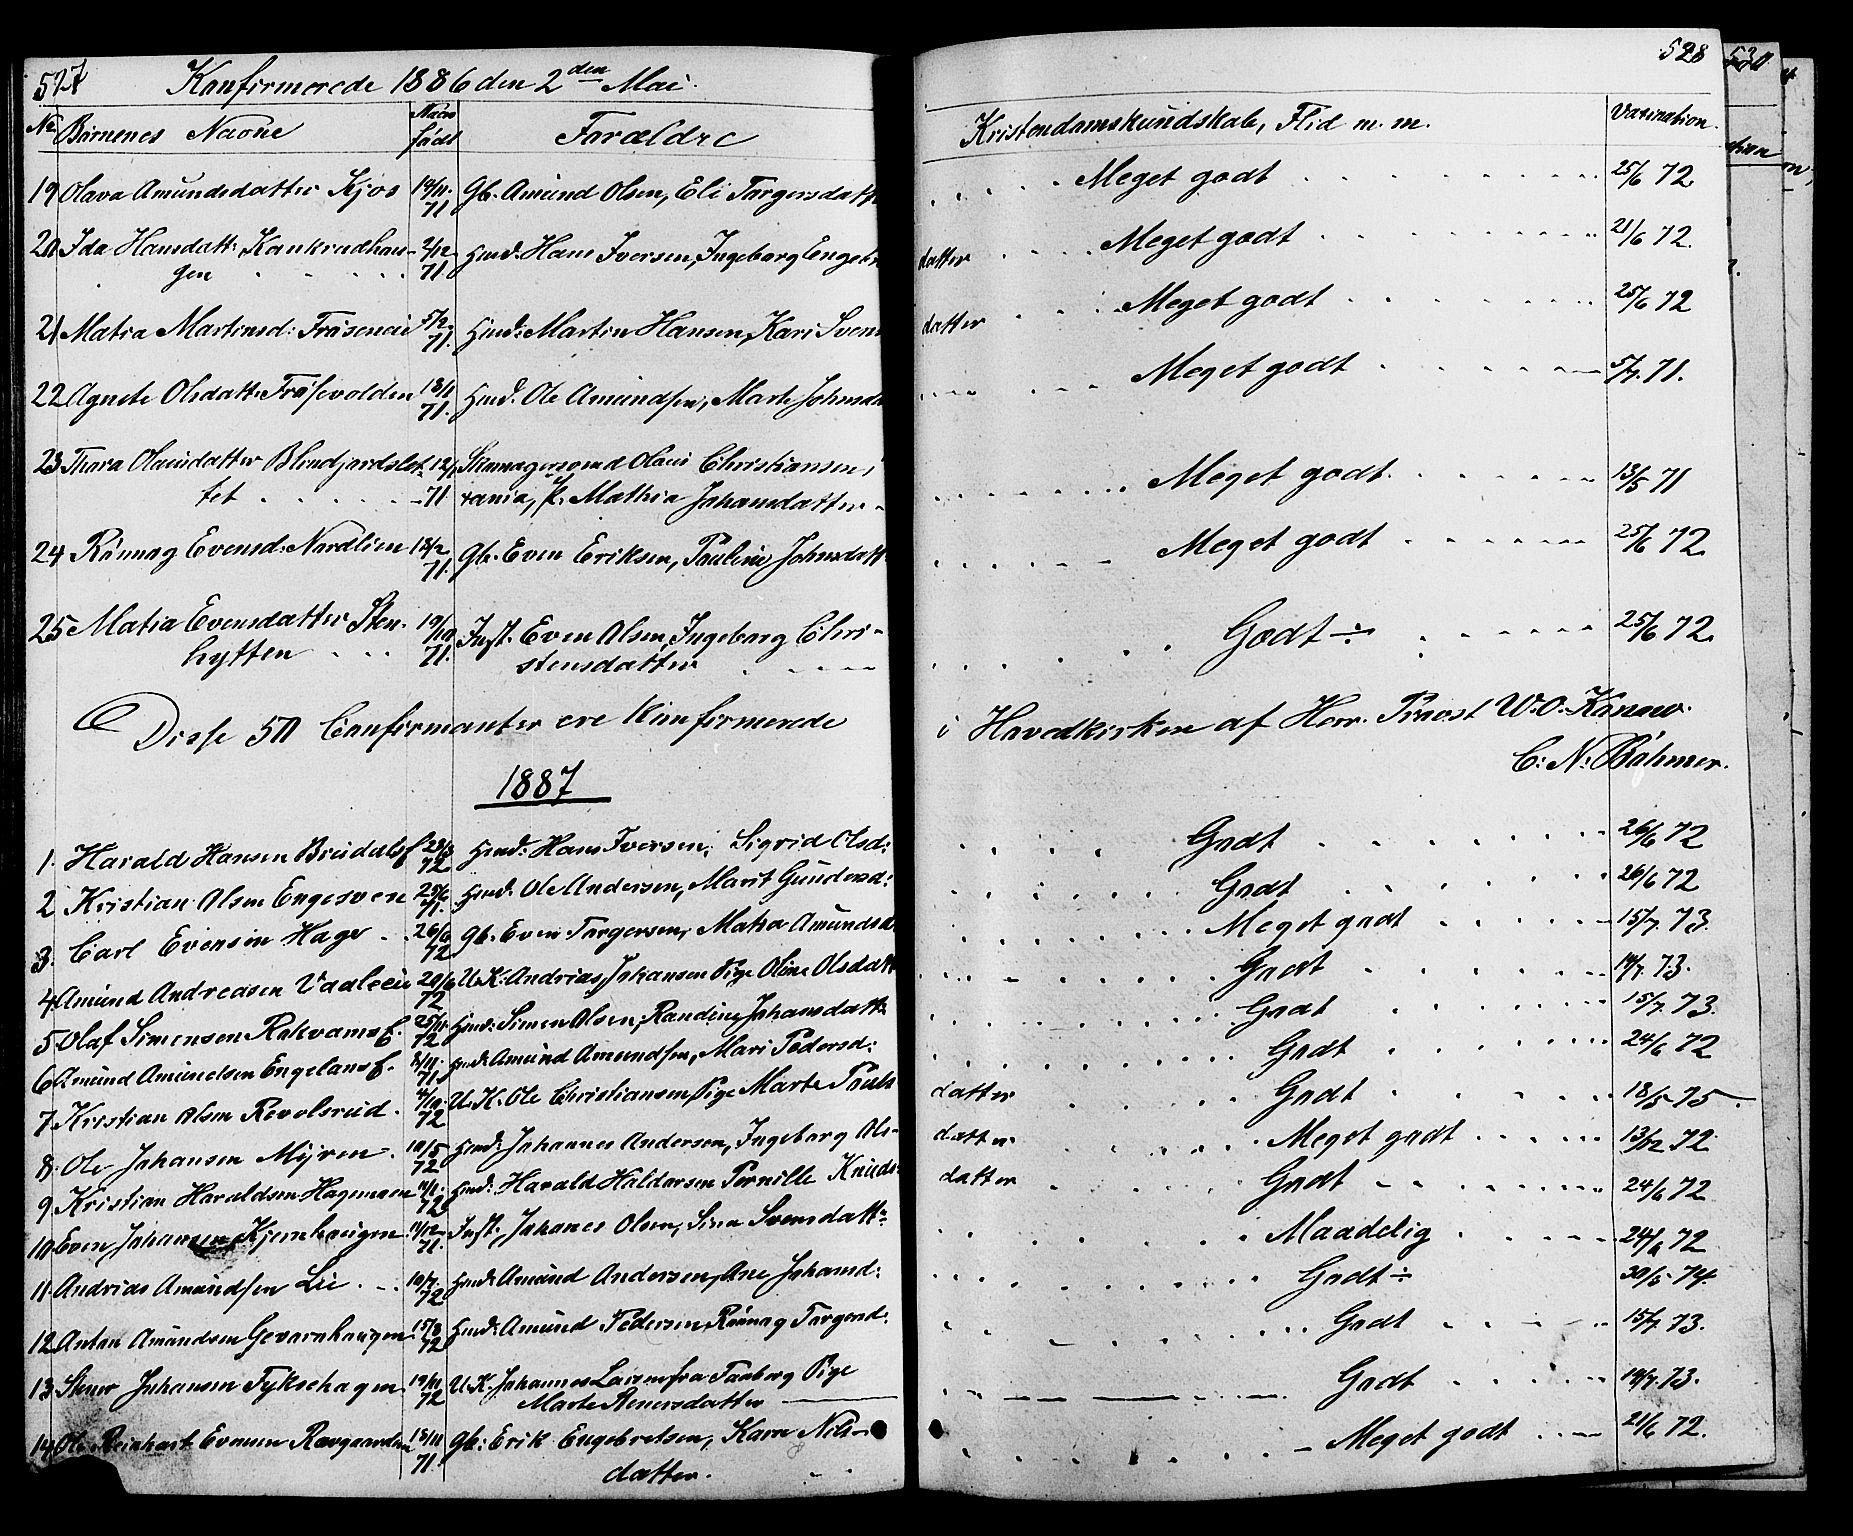 SAH, Østre Gausdal prestekontor, Klokkerbok nr. 1, 1863-1893, s. 527-528